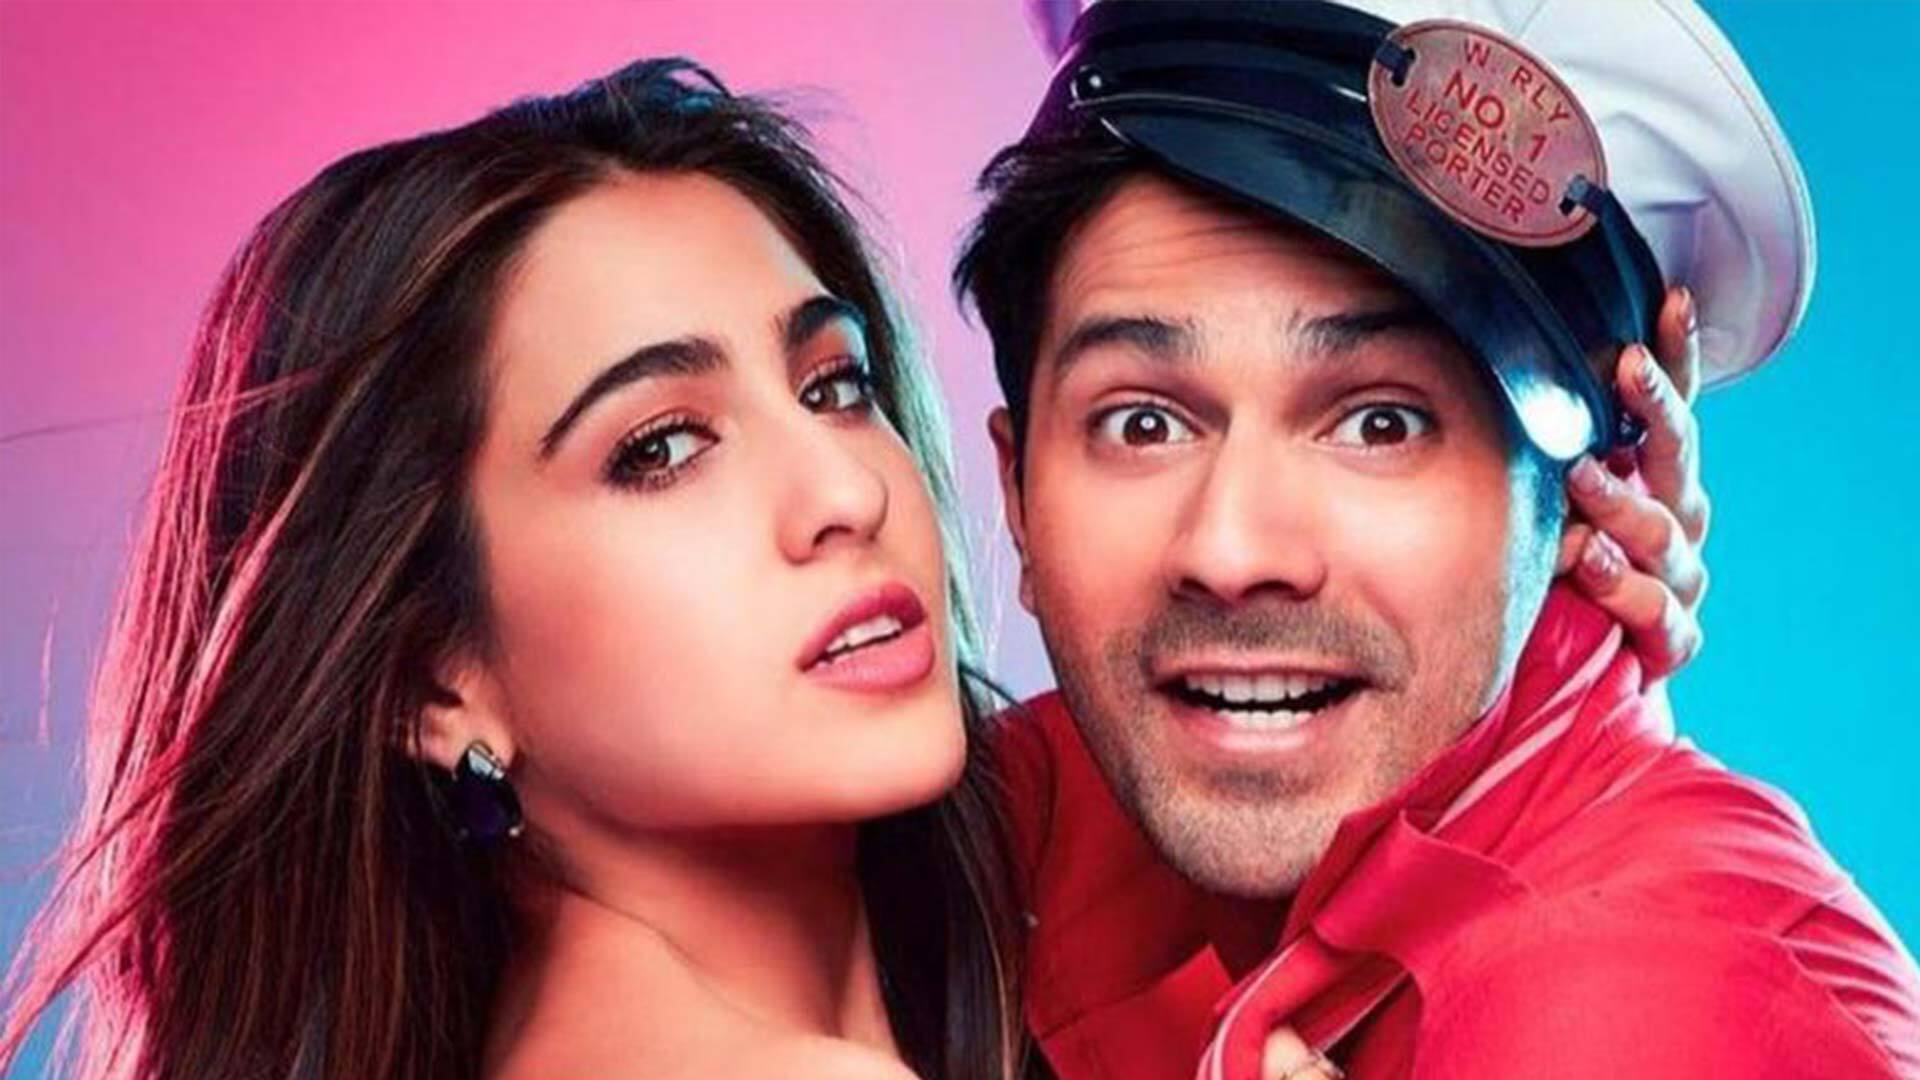 New Coolie No 1 Movie Star Varun Dhawan With Sara Ali Khan Hd Wallpapers